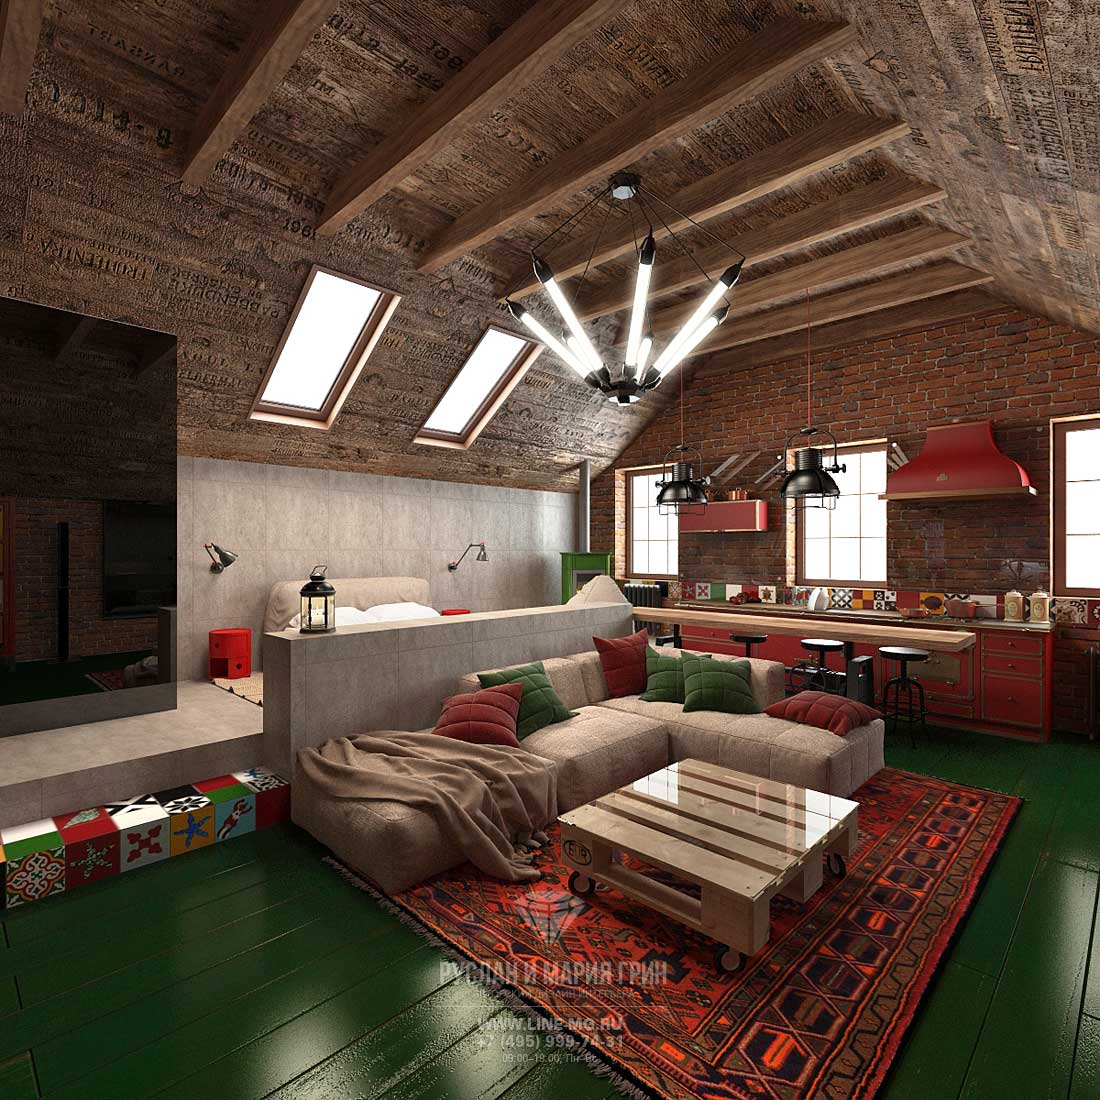 Novelty of 2015. Loft attic design under gable roof